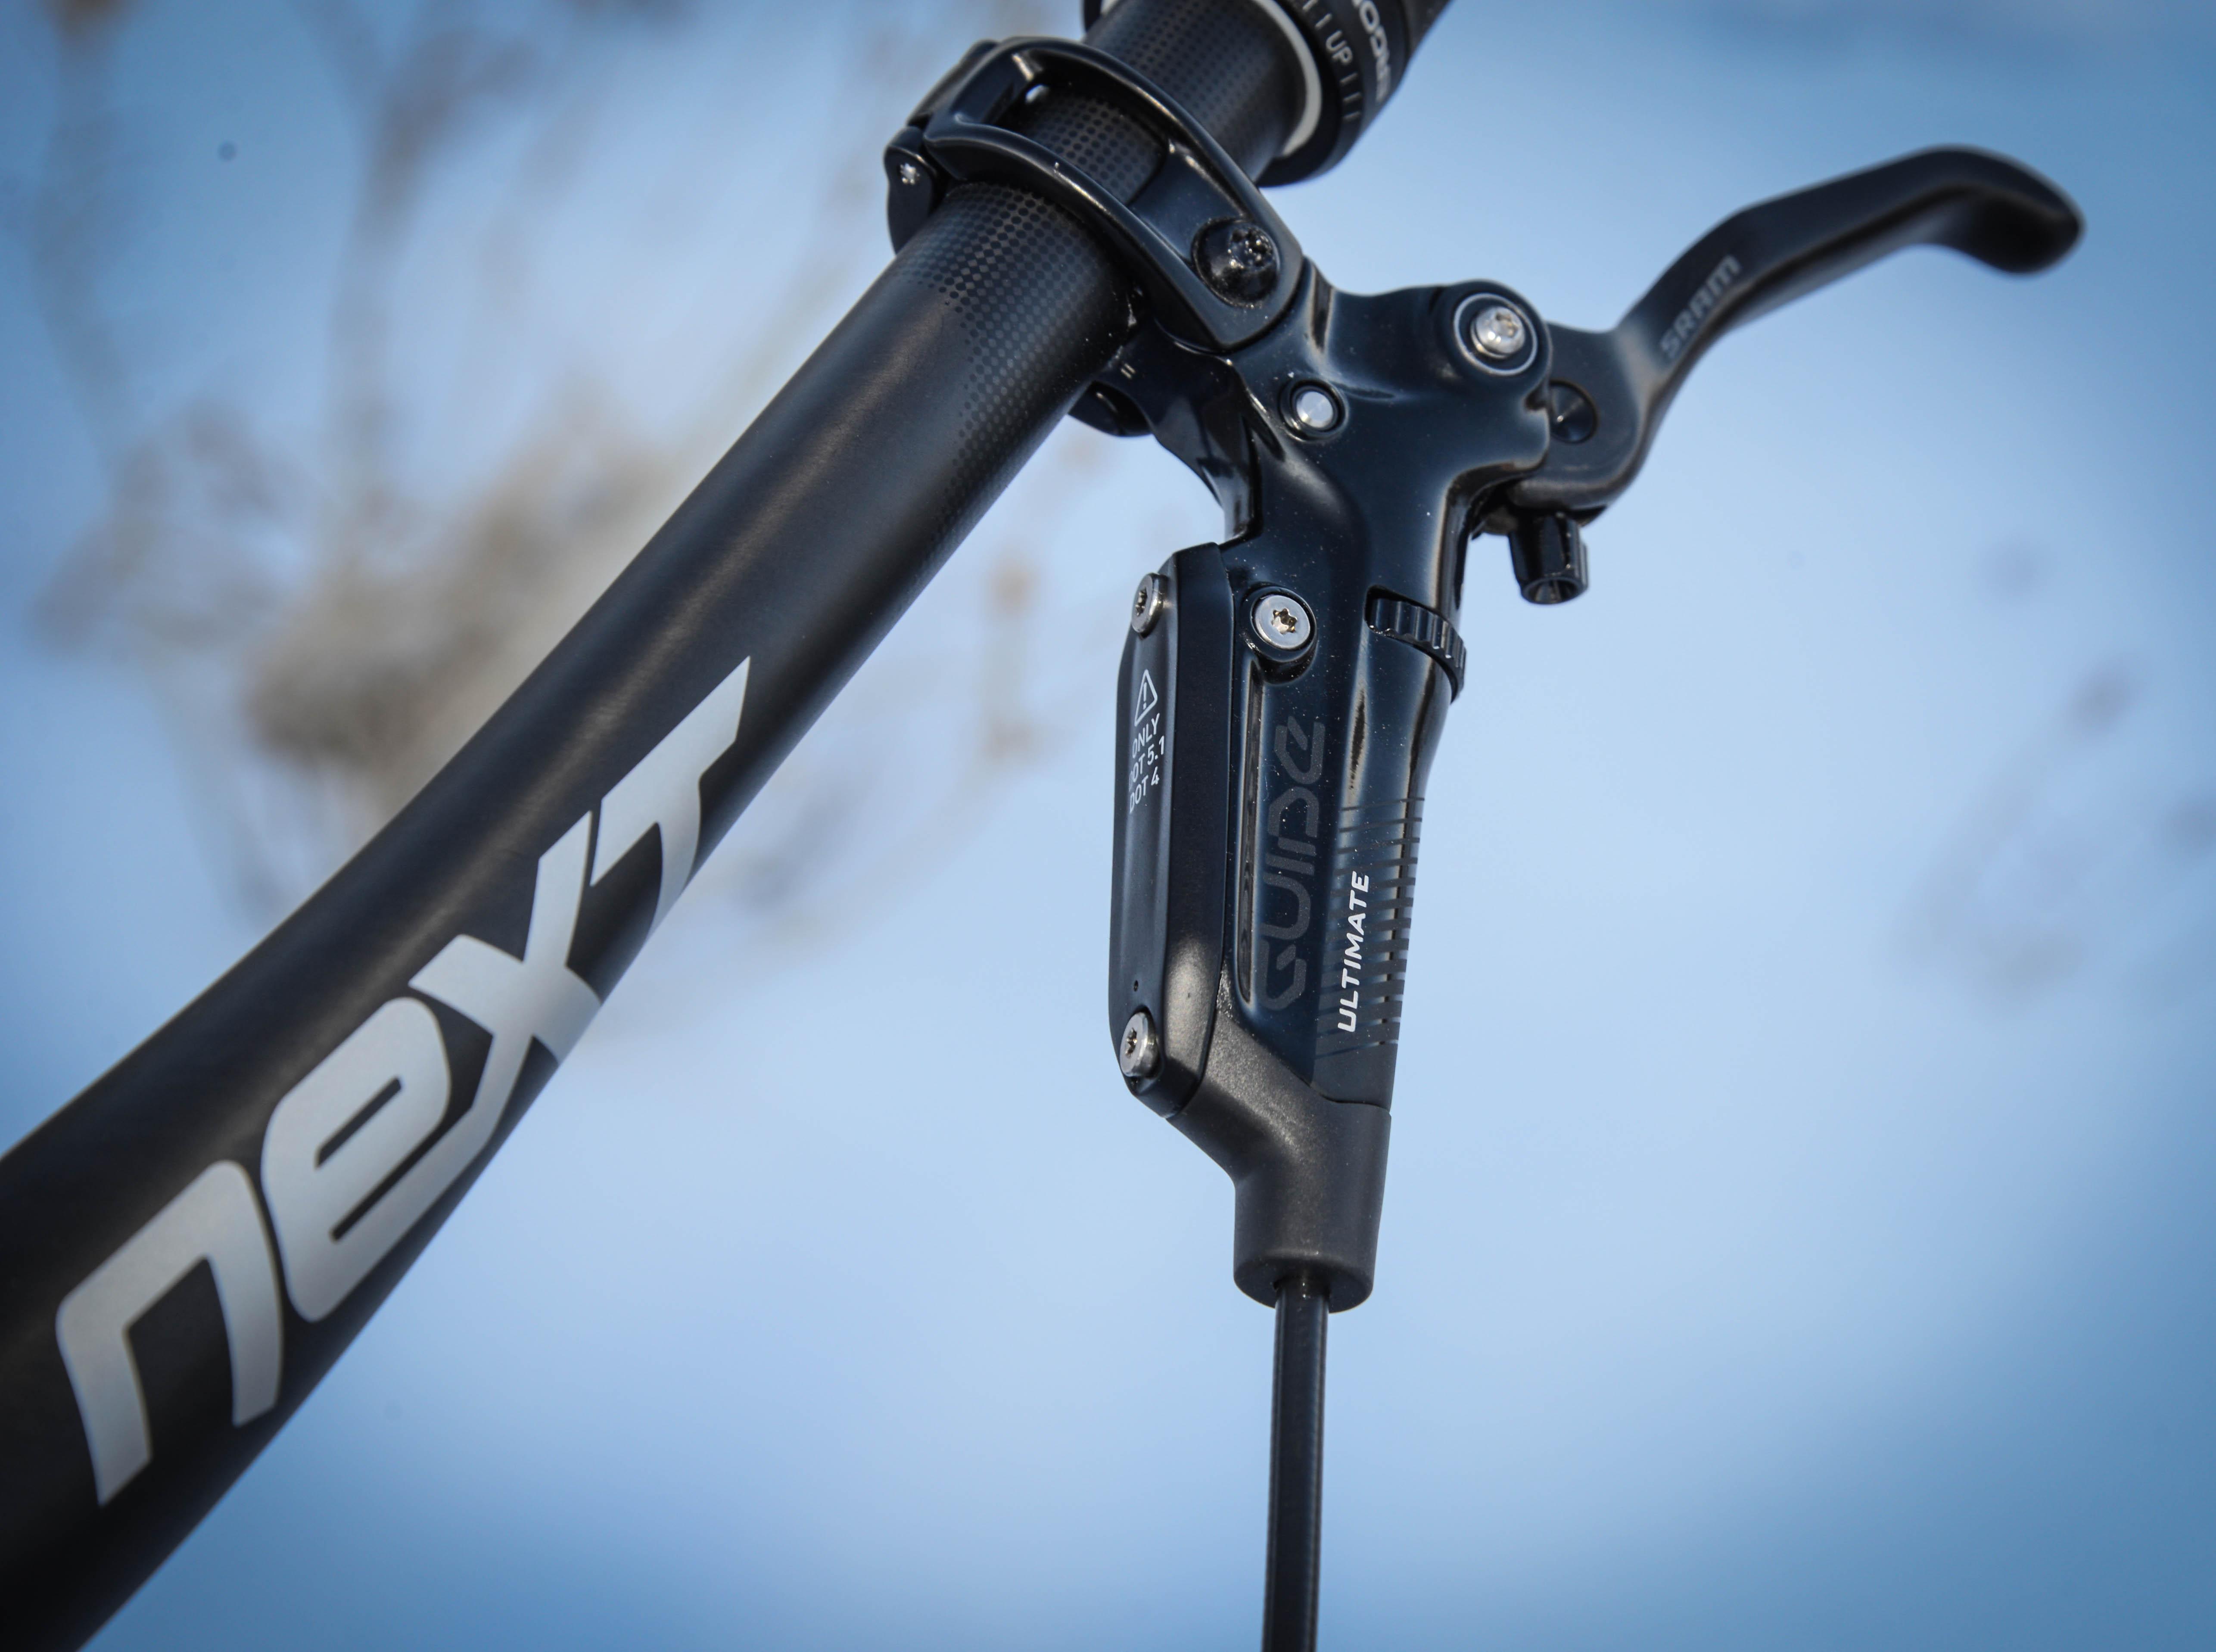 On Review Borealis Crestone Xx1 Fat Bike Singletracks Mountain Honda Zoomer X Wiring Diagram Sram Guide Rsc Brakes And The Next Carbon Bar